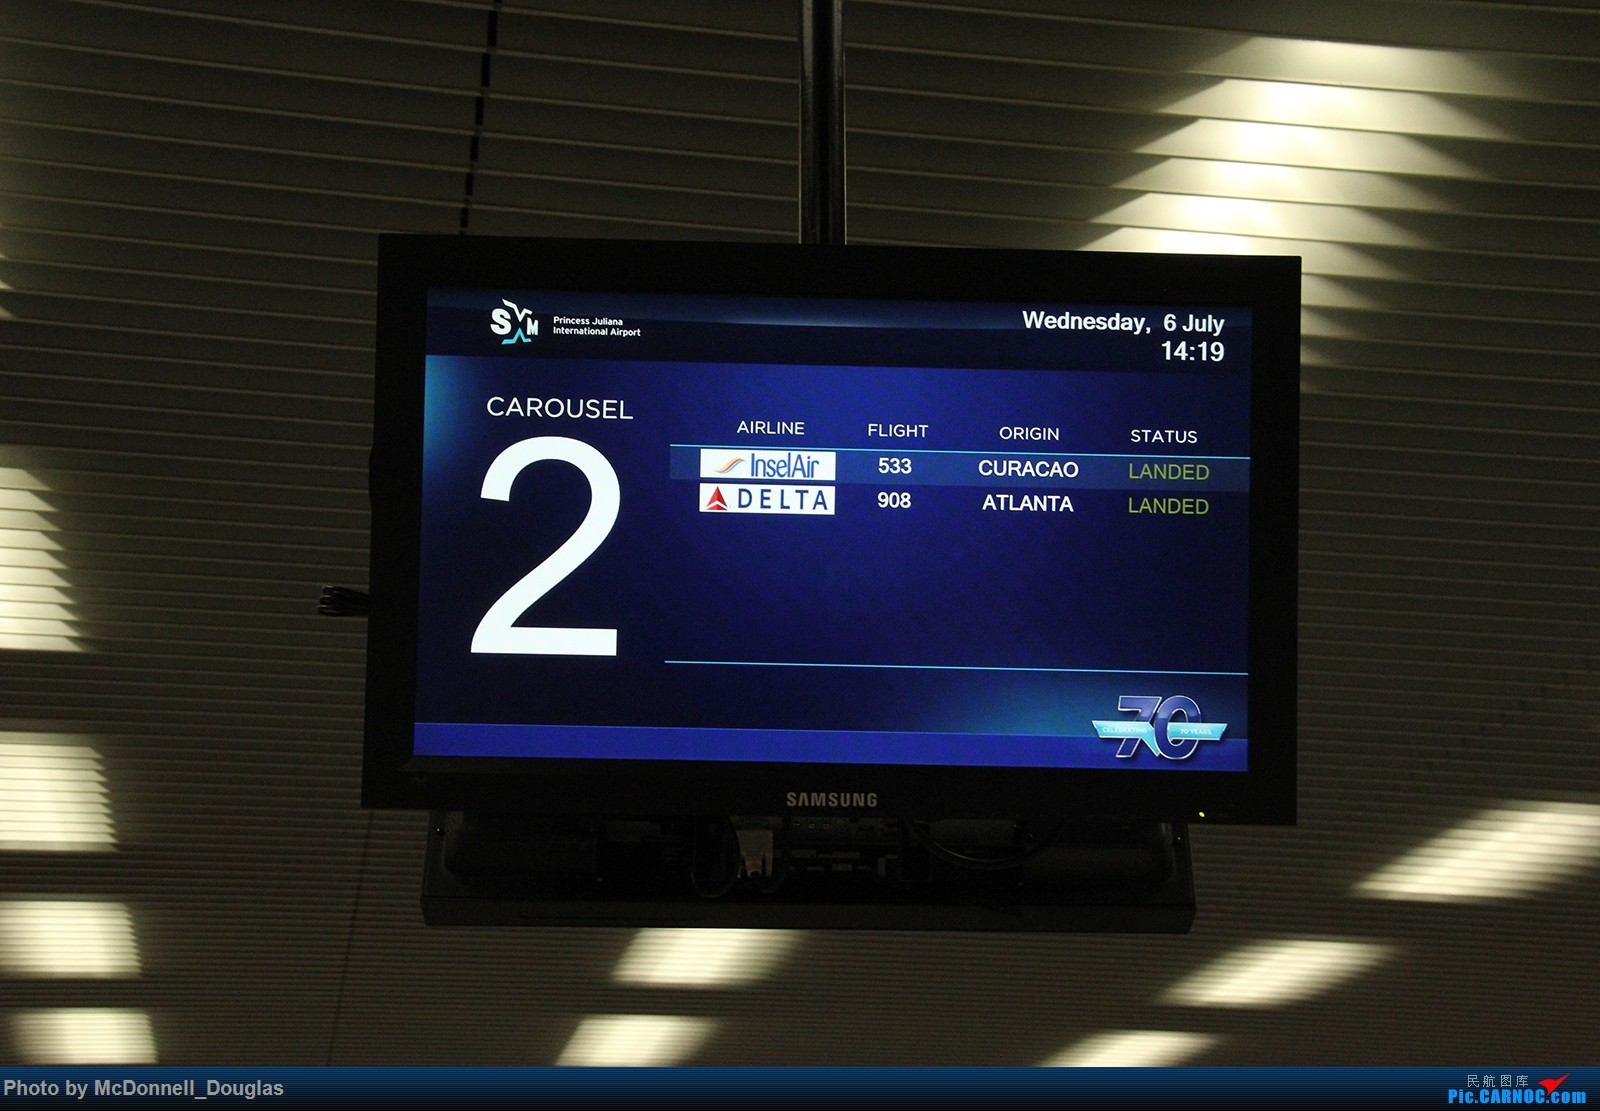 Re:[原创]【上海飞友会】图会很多,也有很多驾驶舱,杂七杂八的美帝,梦寐以求的圣马丁,这更绝不弃贴【驾驶舱已出现】【已更新至圣马丁部分】 BOEING737-732 N301DQ 荷属安的列斯群岛朱利安娜公主机场 荷属安的列斯群岛朱利安娜公主机场